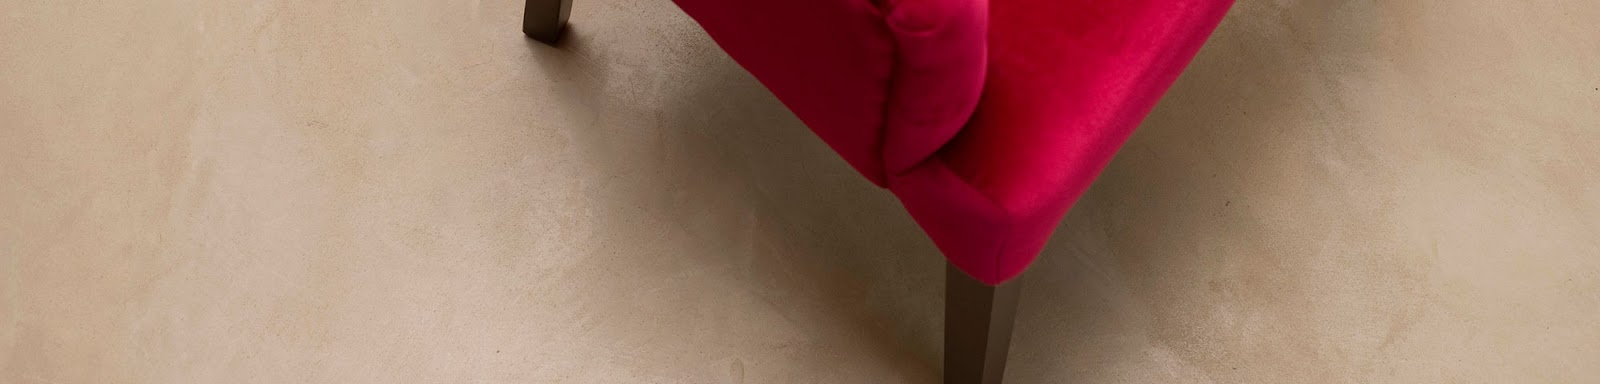 Cemento decorativo microcemento autonivelantes seamlesscret for Cemento pulido exterior